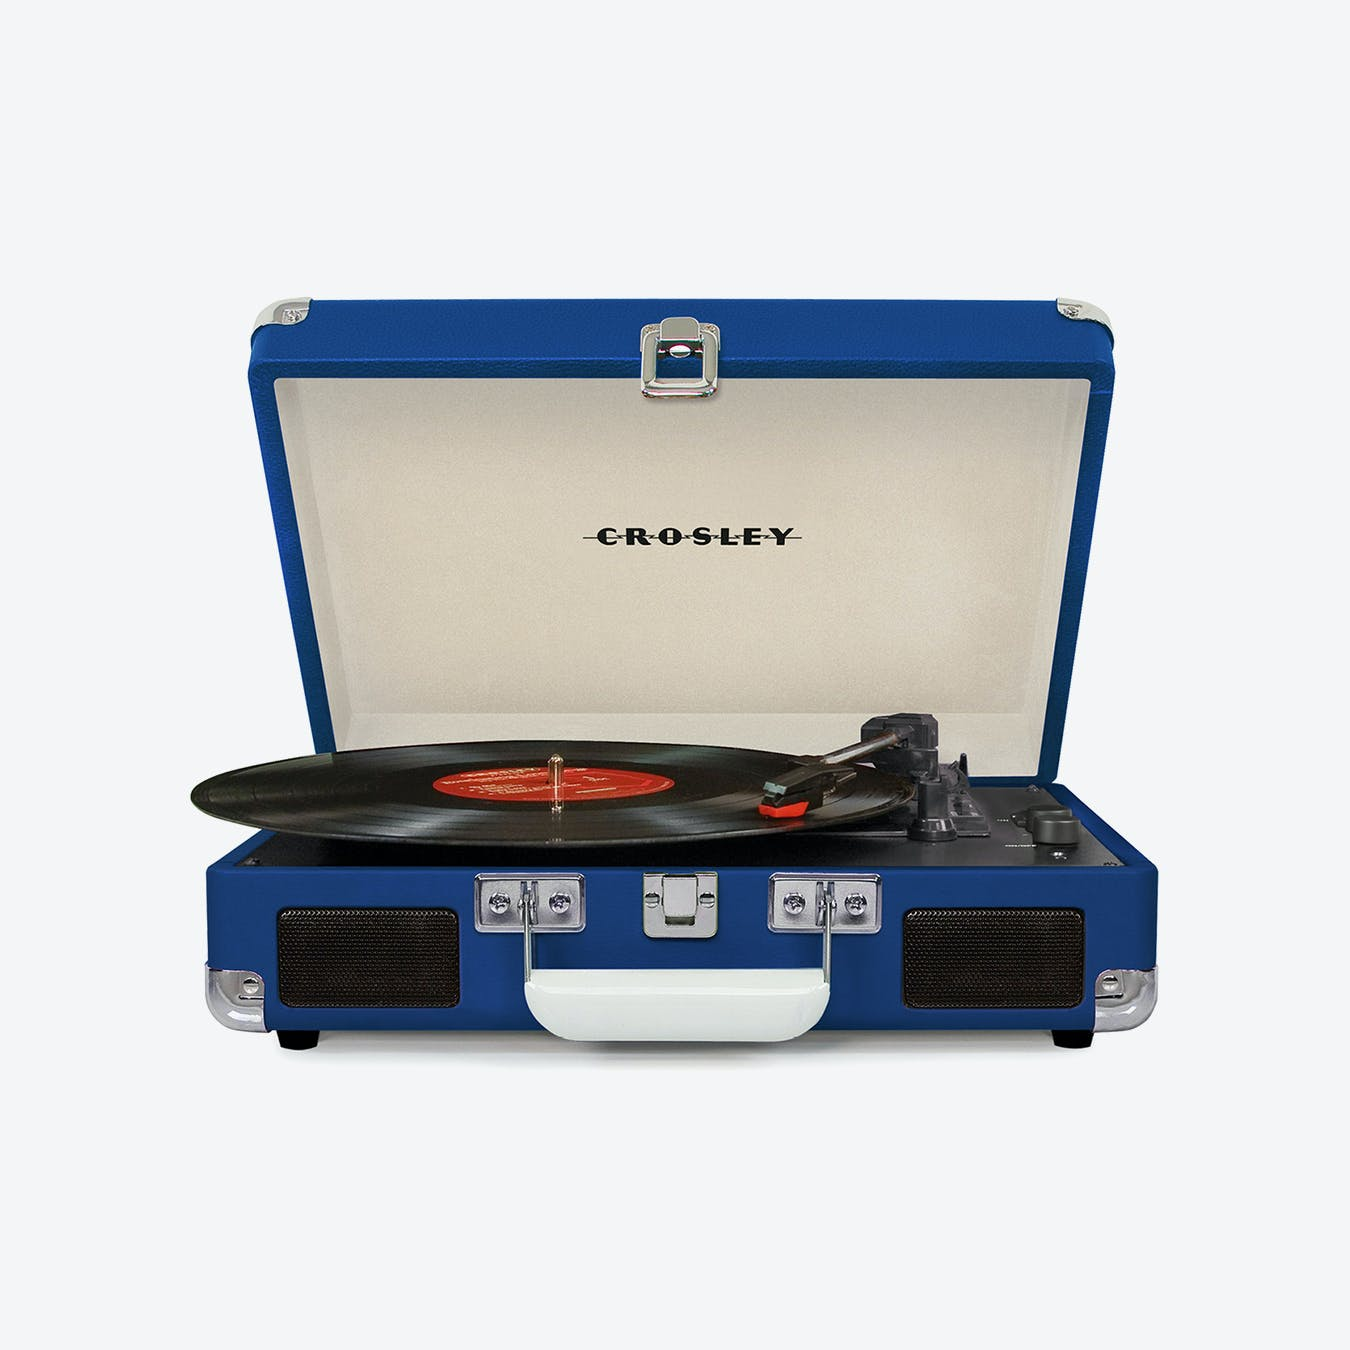 Crosley Cruiser Deluxe - Blue